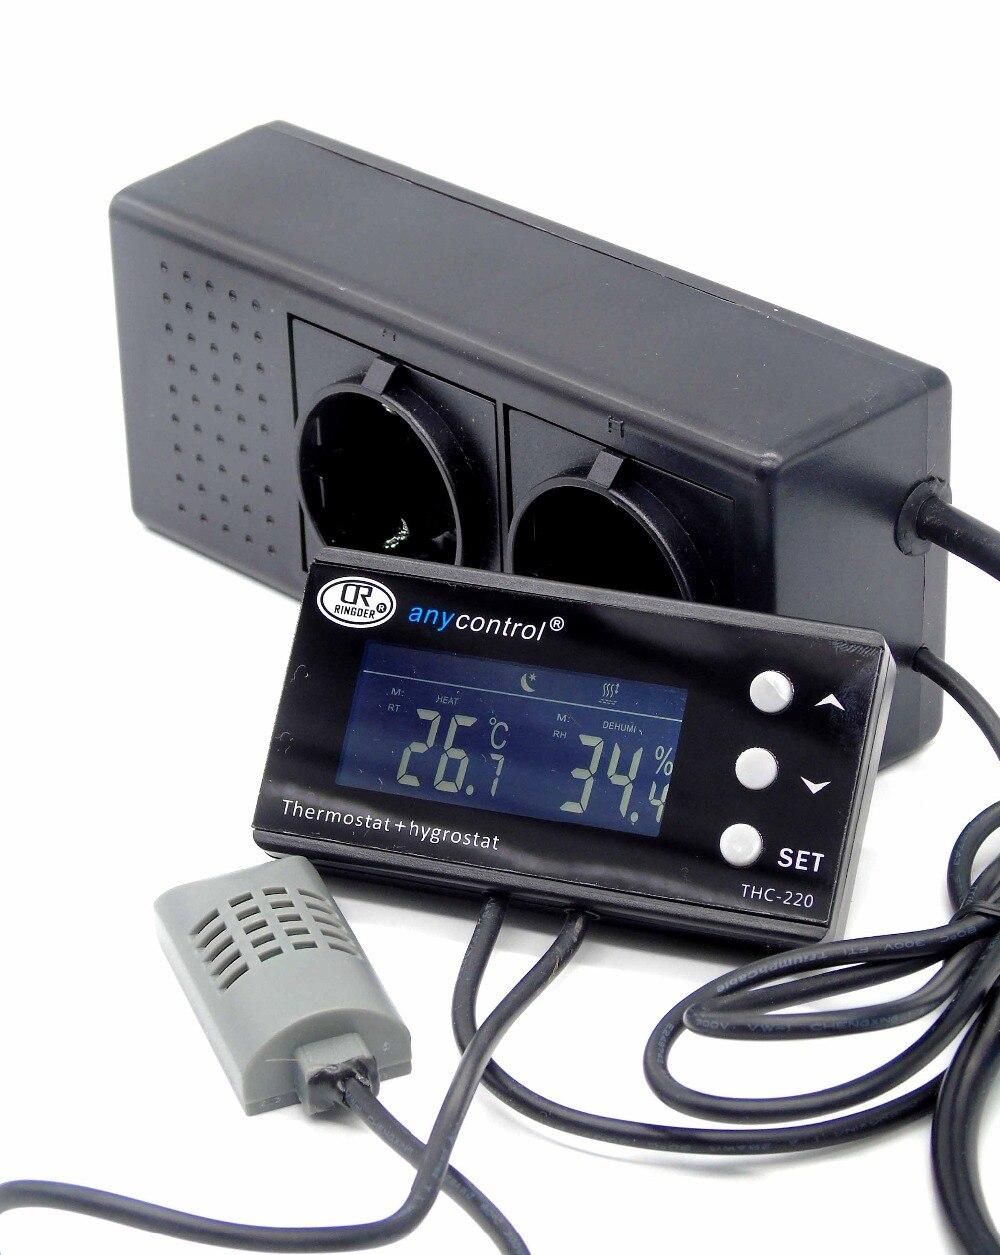 Egg incubator intelligent temperature humidity controller with Thermo hygrostat Greenhouse Reptile Terrarium